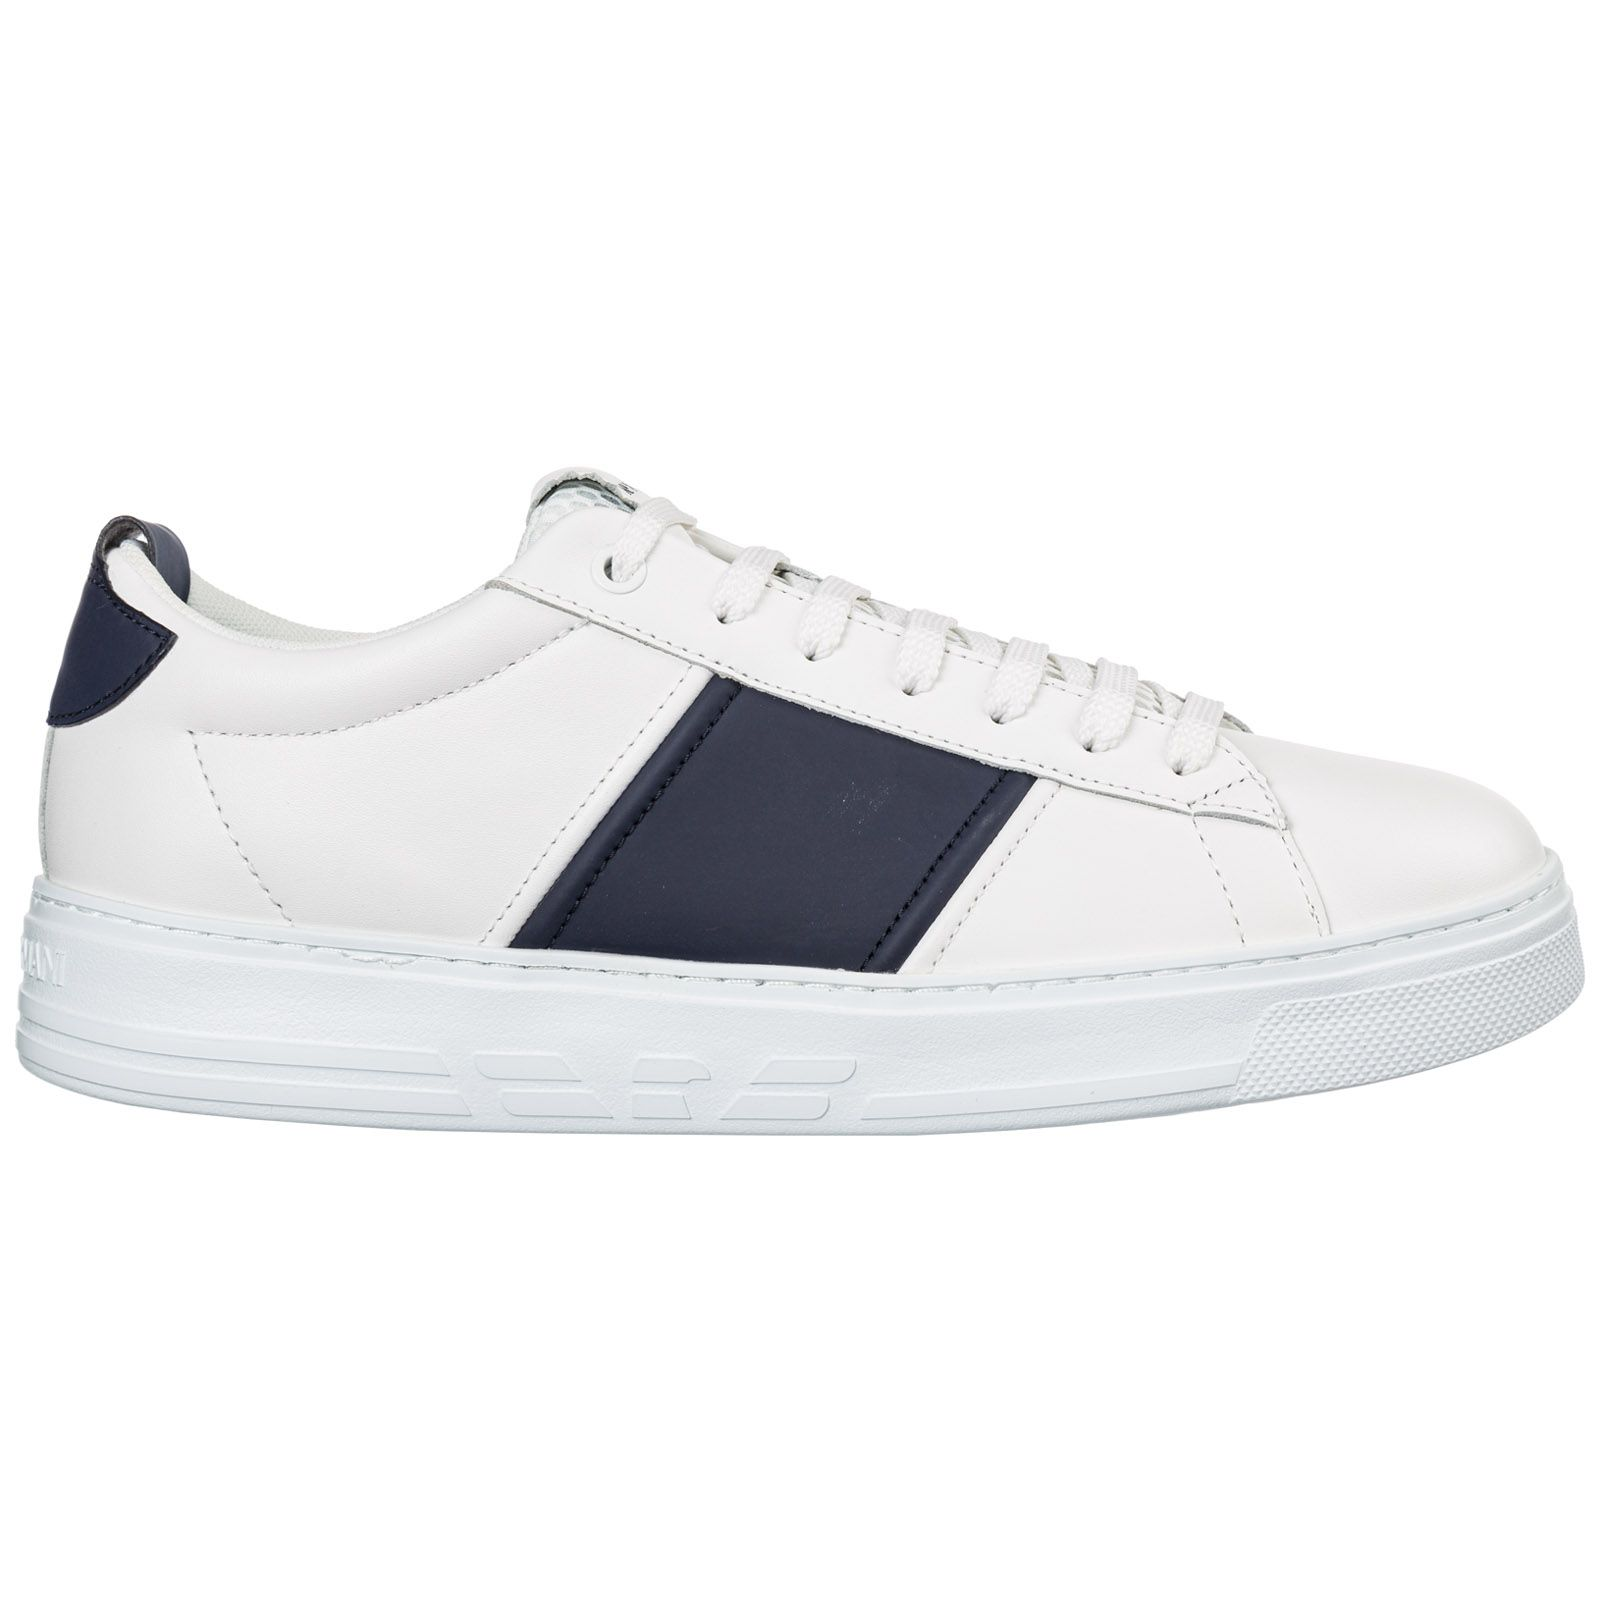 Armani shoes mens, Armani men